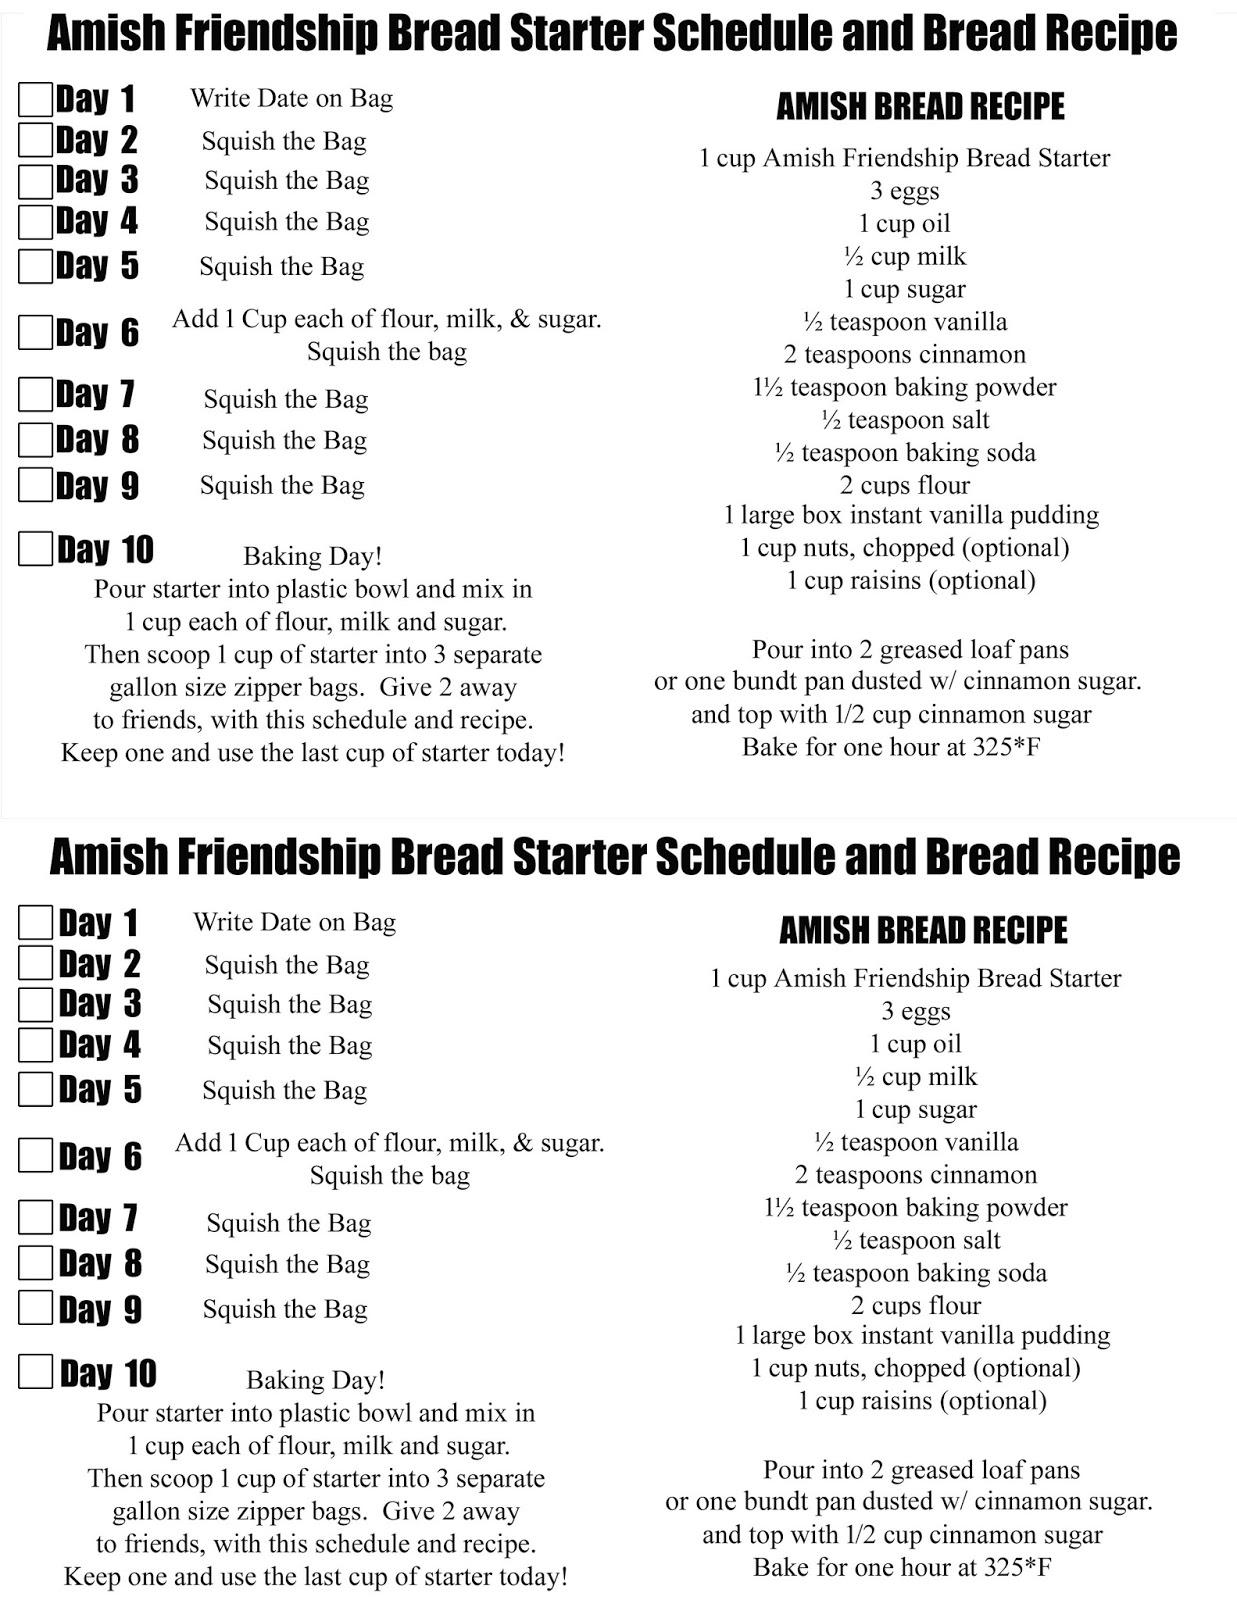 Amish Friendship Bread Starter And Recipe